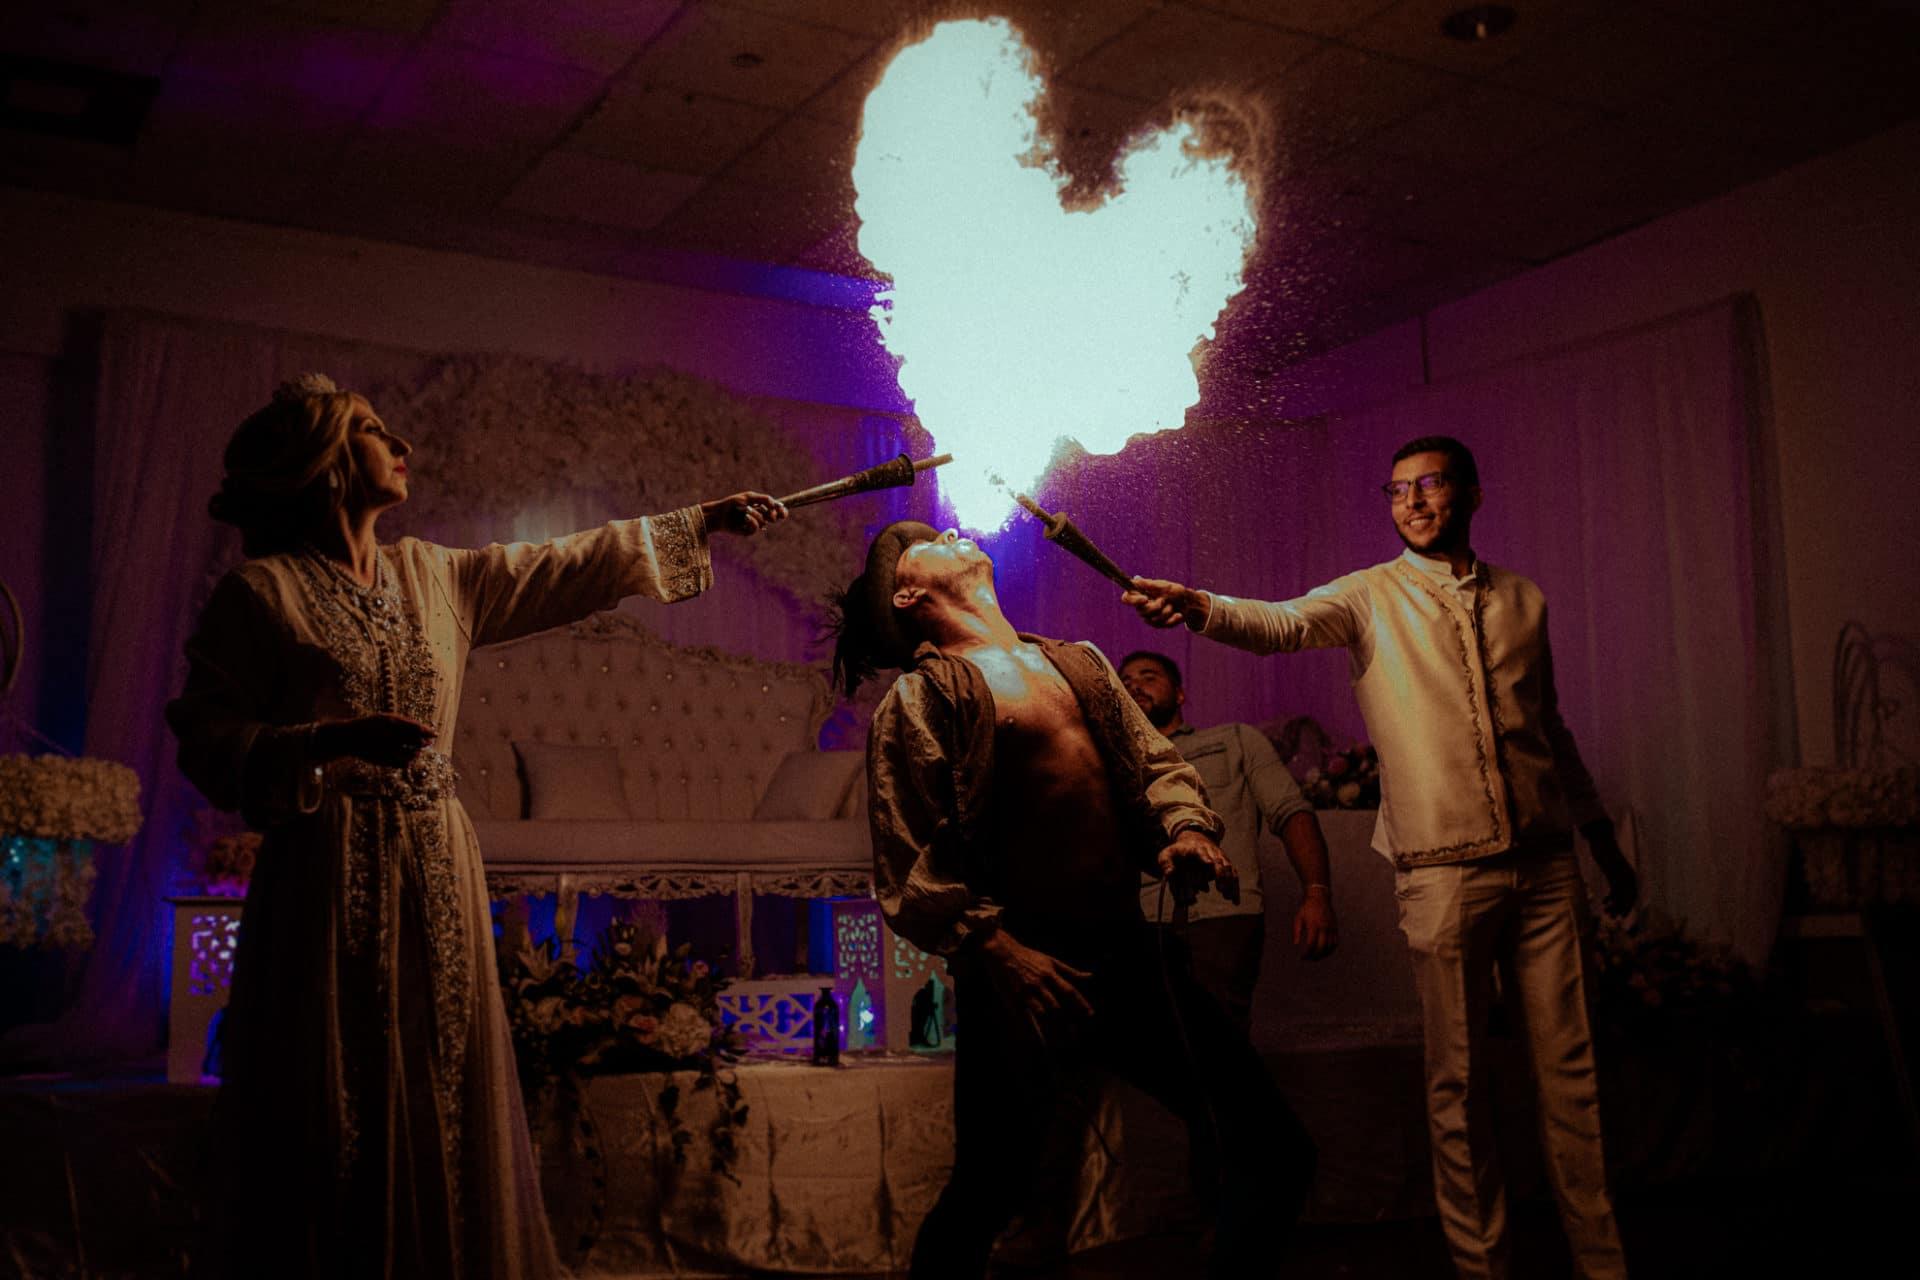 cracheur de feu en forme de coeur mariage